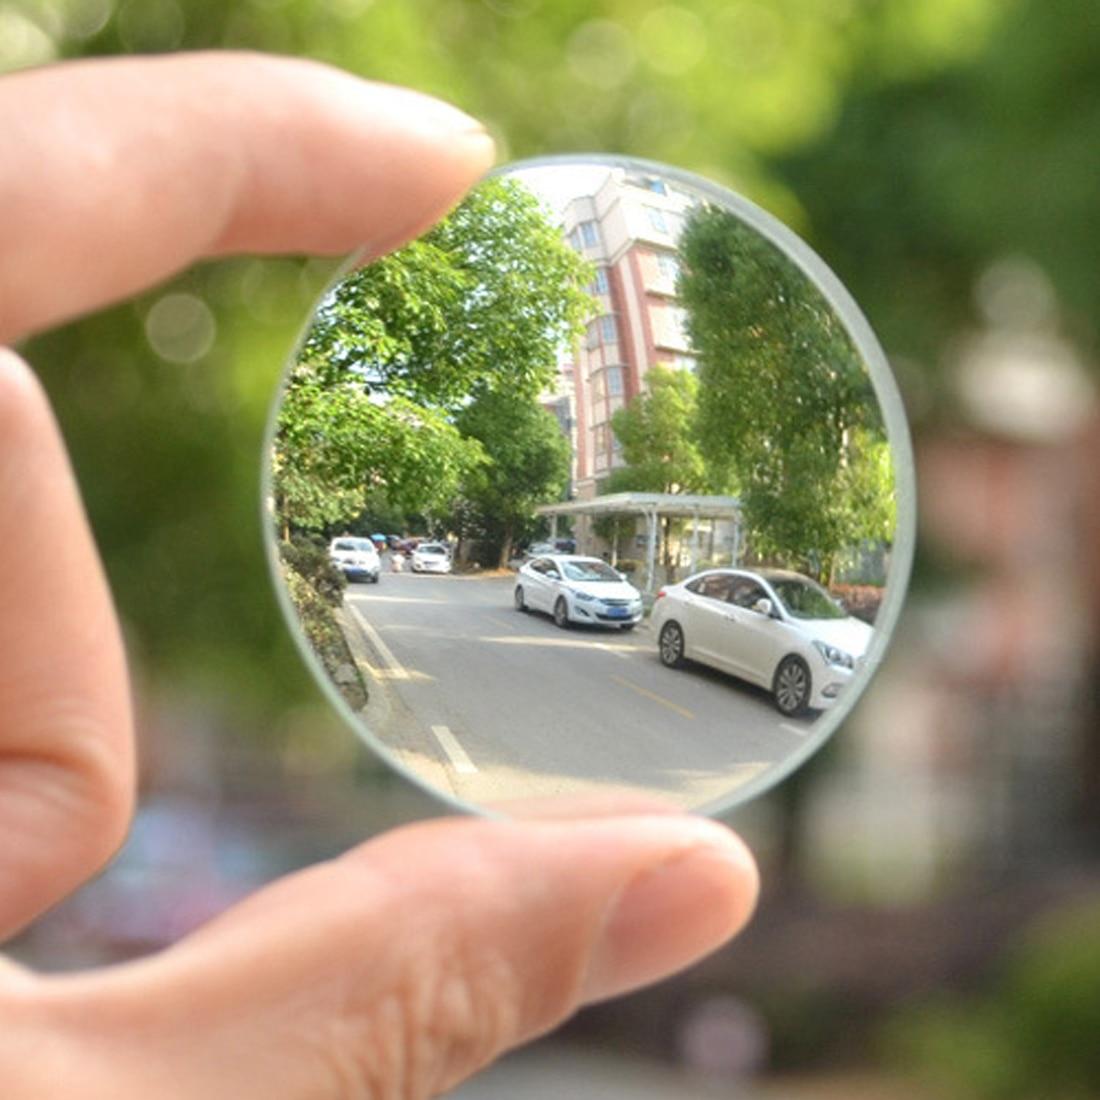 Dewtreetali Car 360 Degree Framless Blind Spot Mirror Wide Angle Round HD Glass Convex Rear View Mirrors 2 Pcs